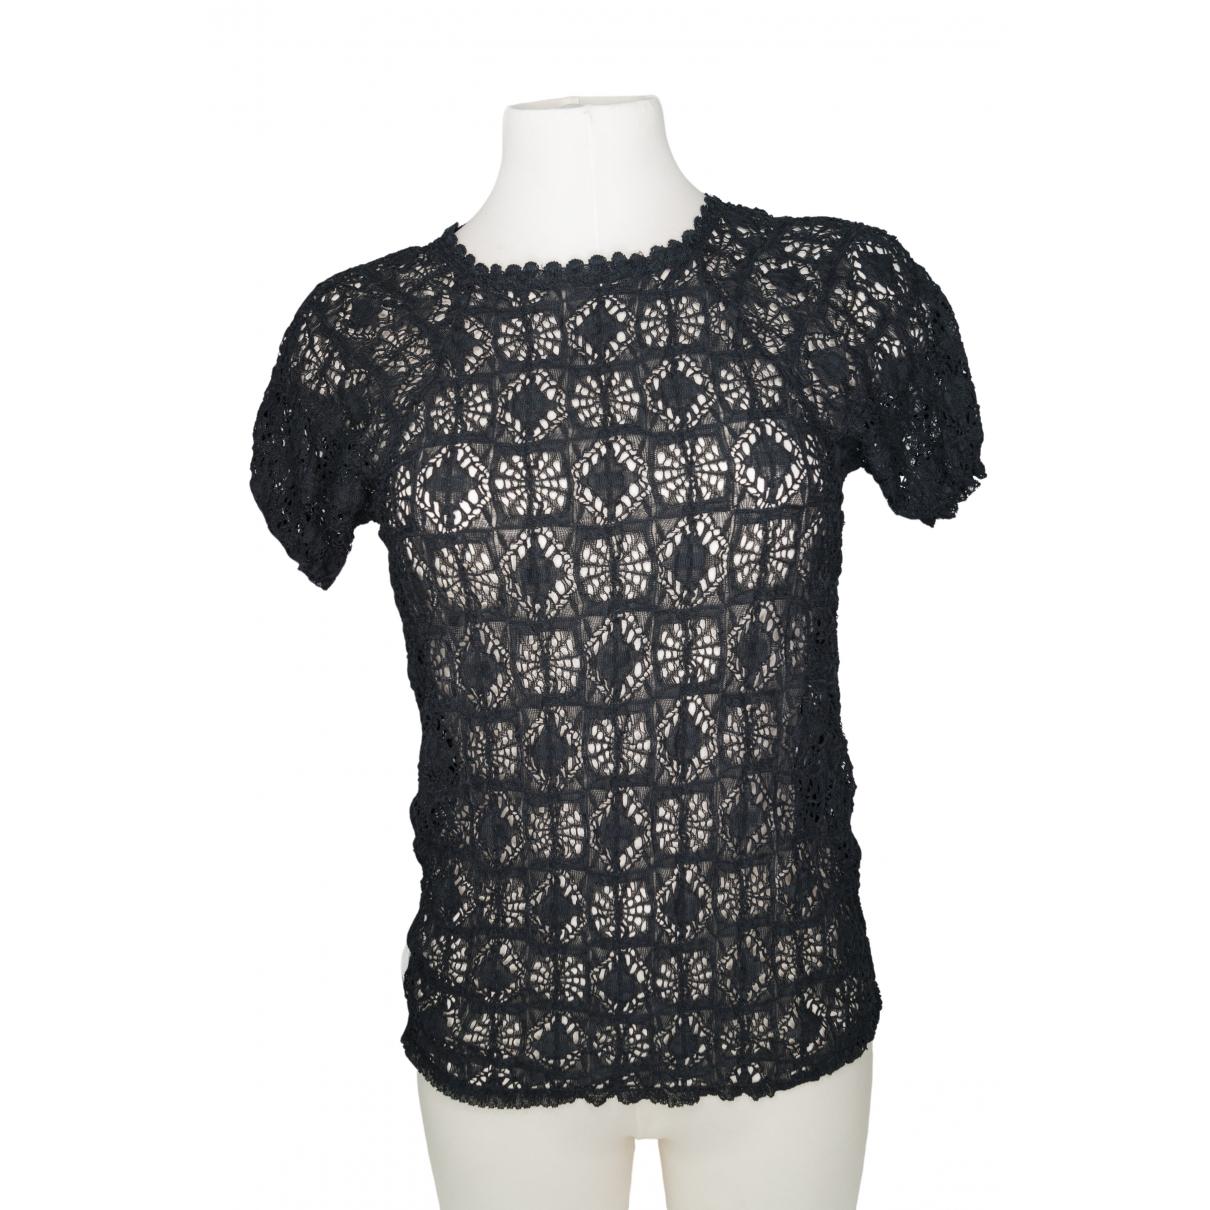 Isabel Marant Etoile \N Black Cotton  top for Women 3 0-5